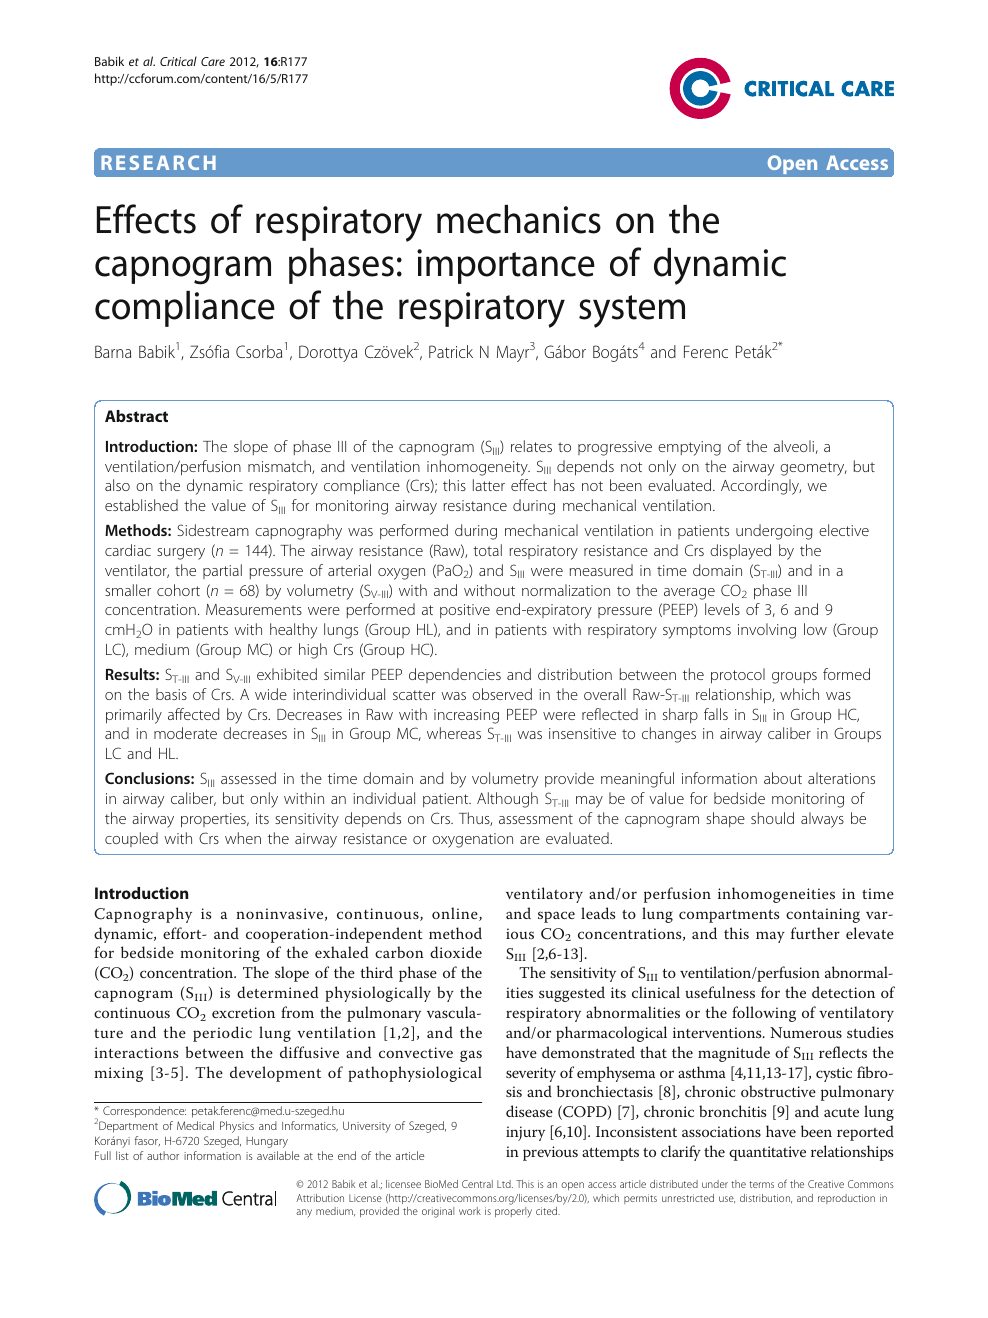 Effects of respiratory mechanics on the capnogram phases